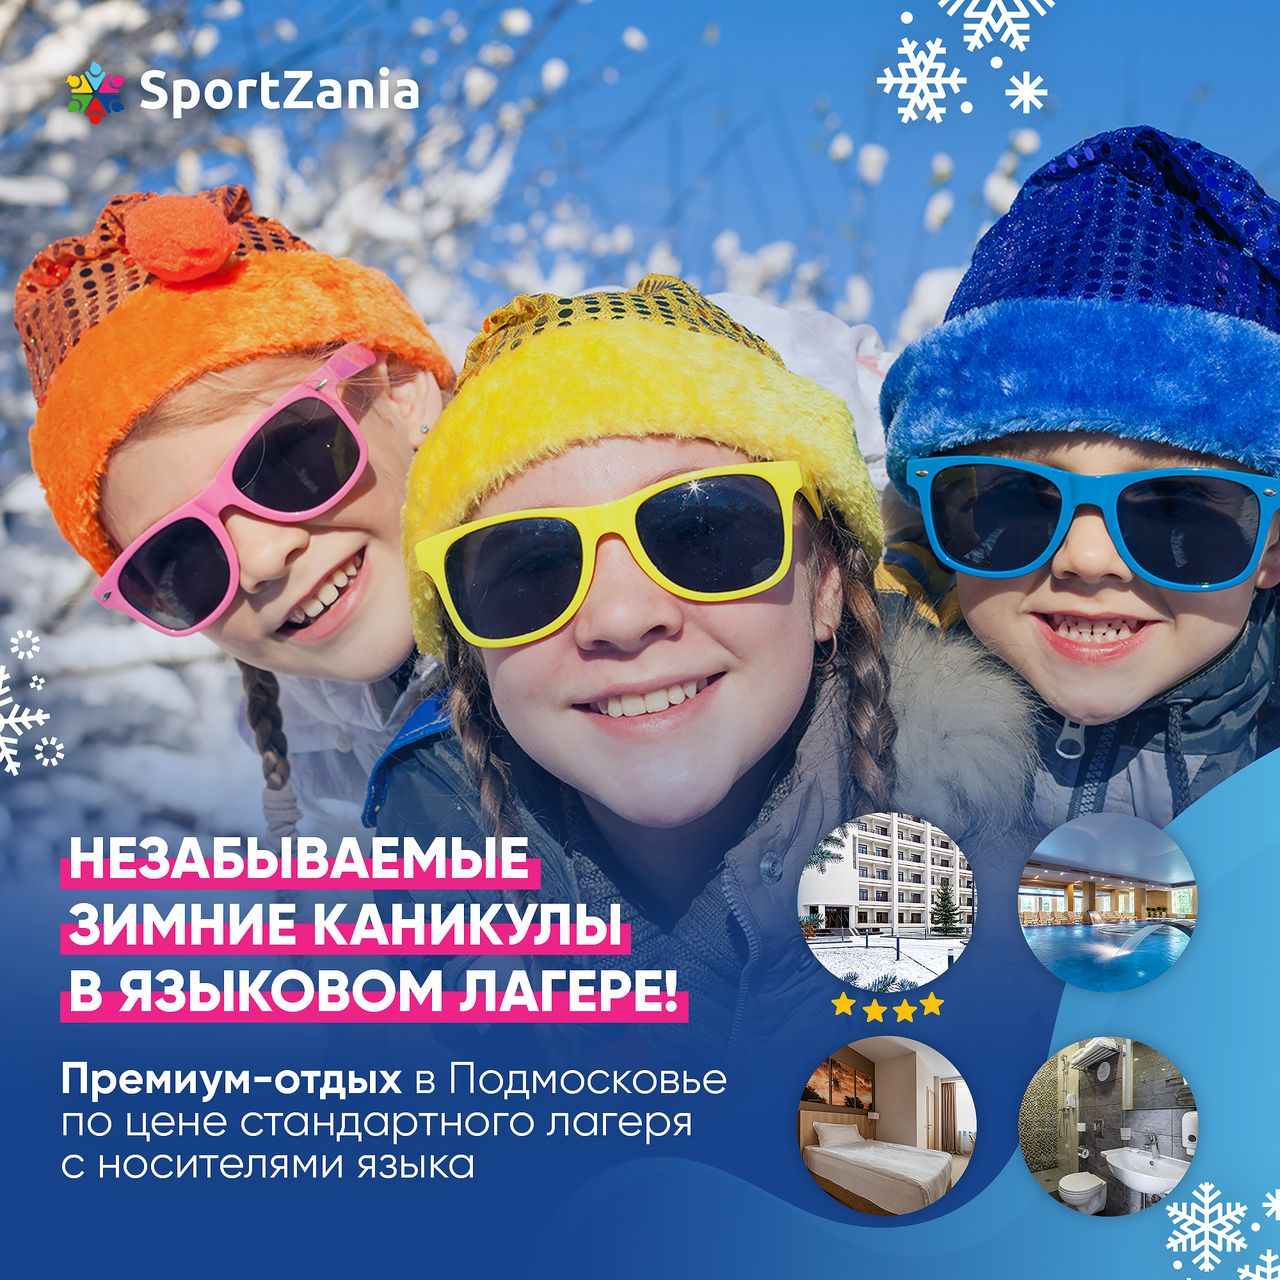 SportZania